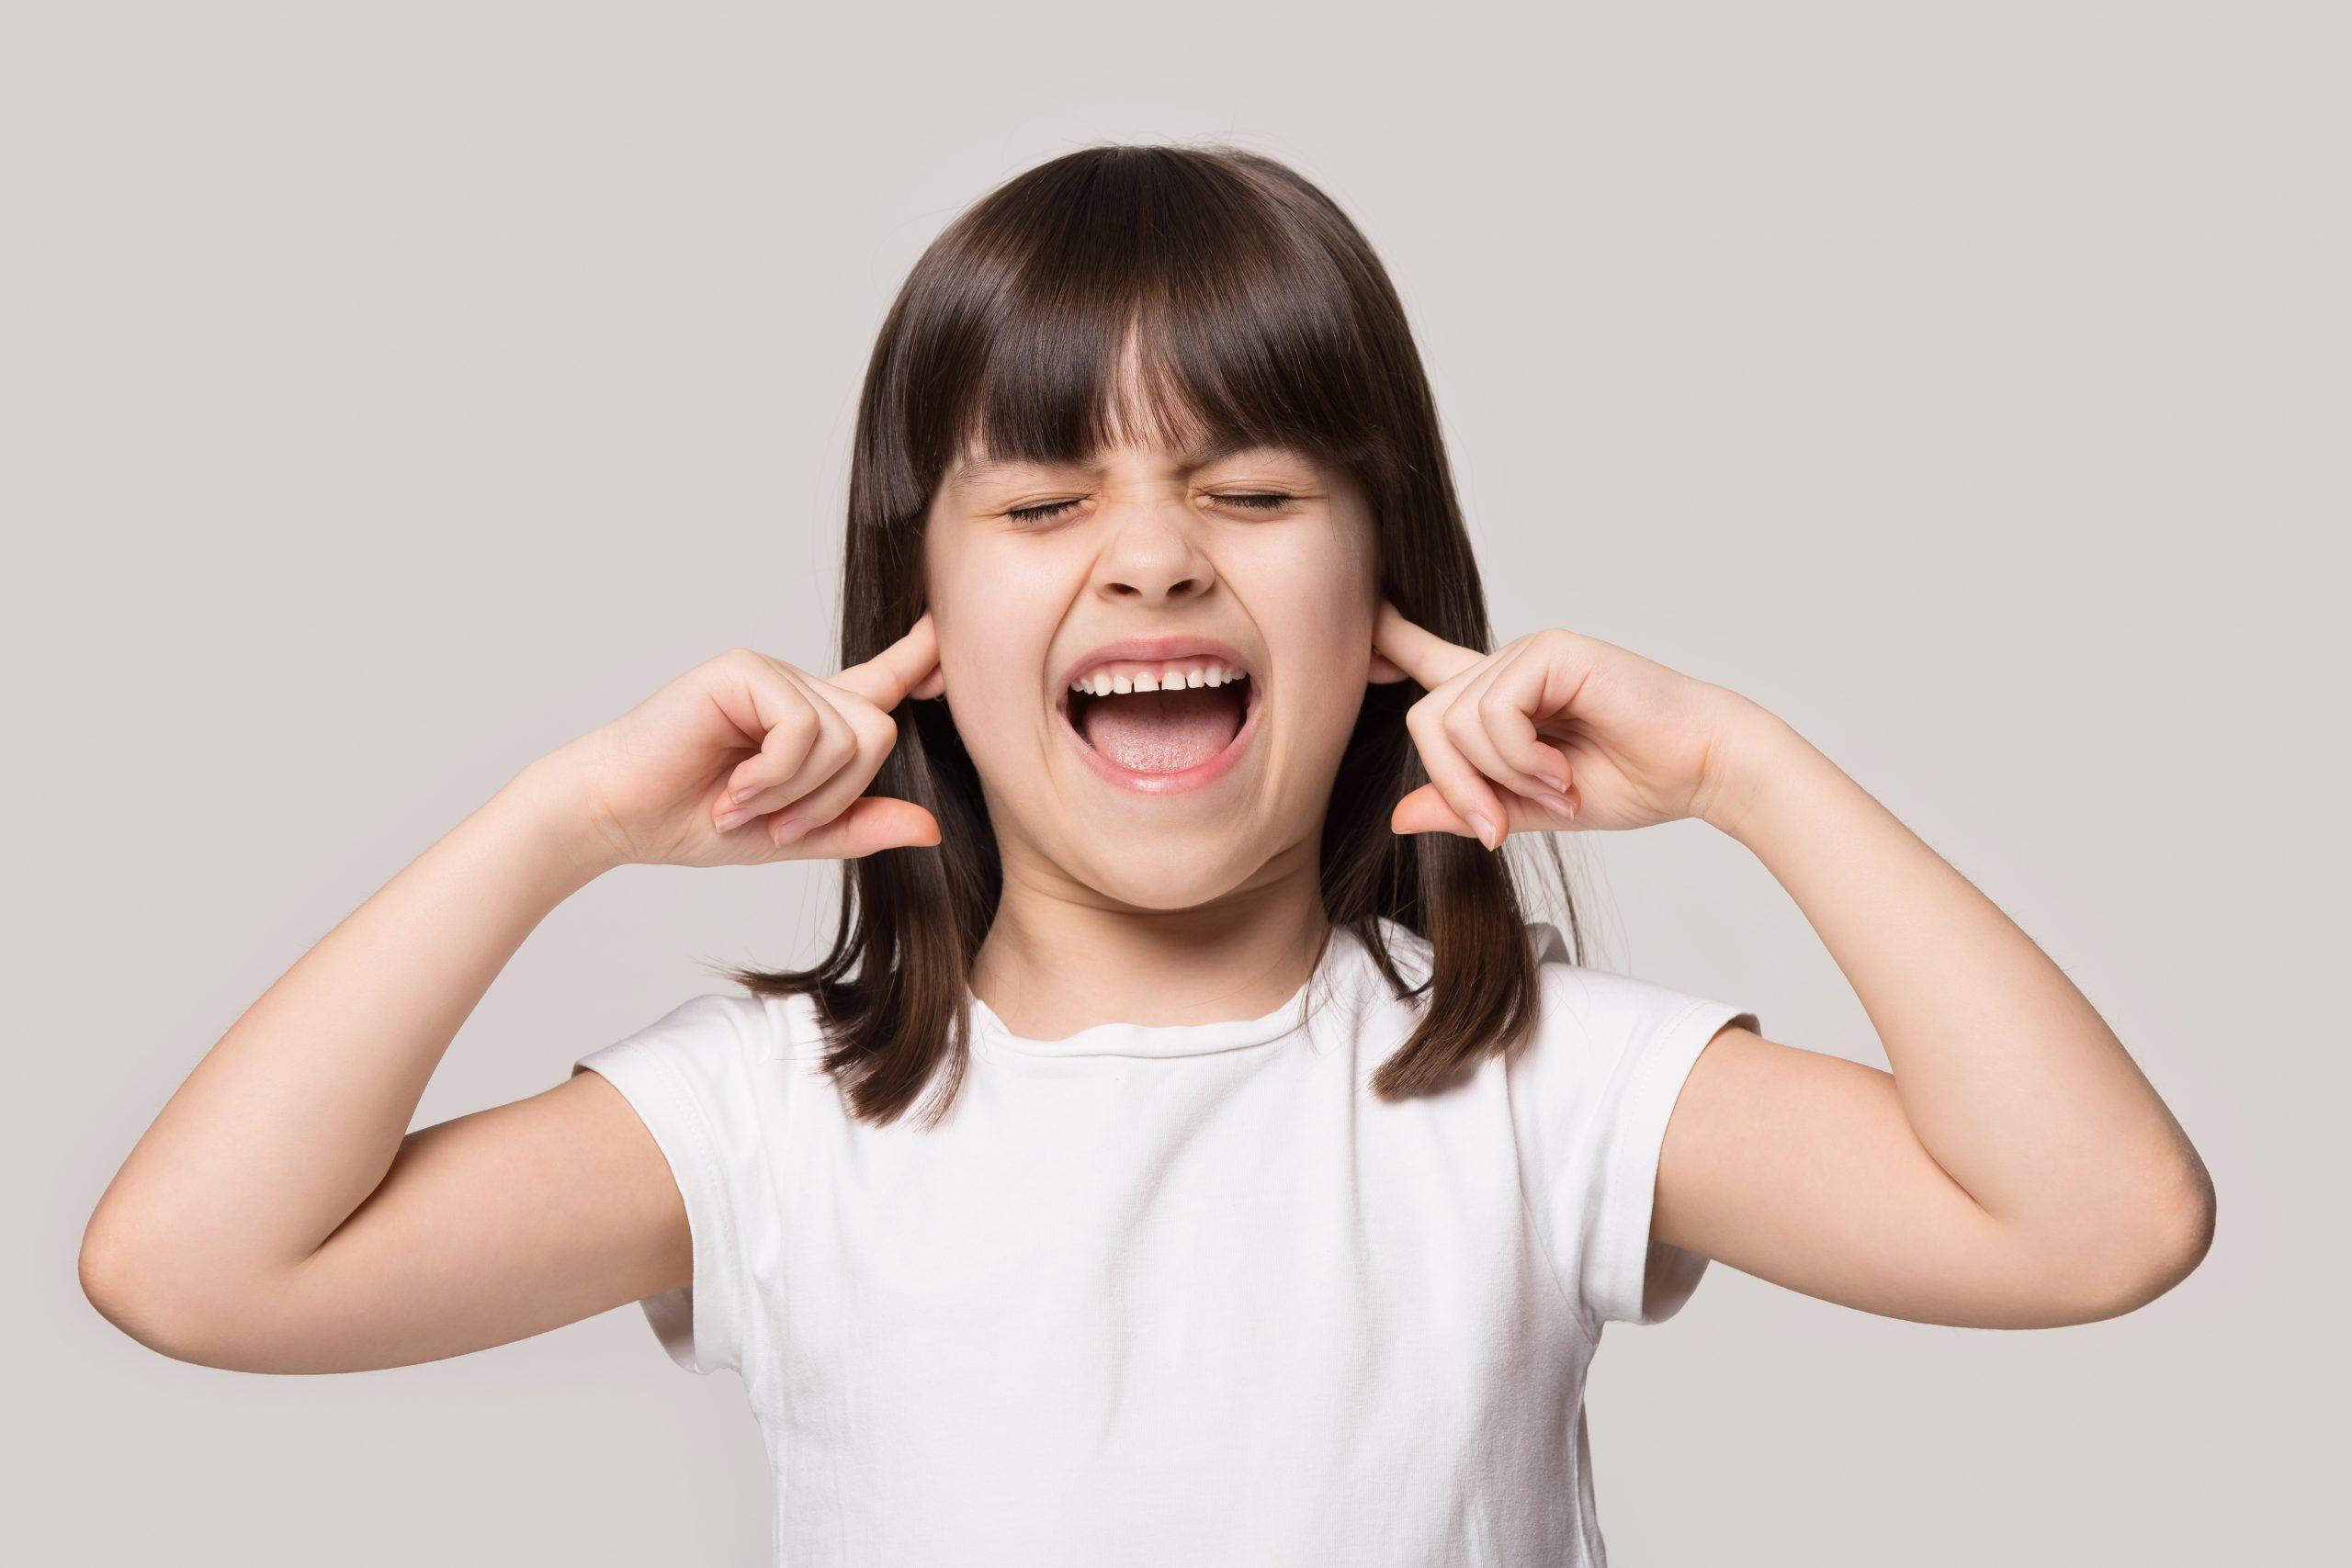 Zappelphilipp-Diagnose: Berechtigung zur Angst?